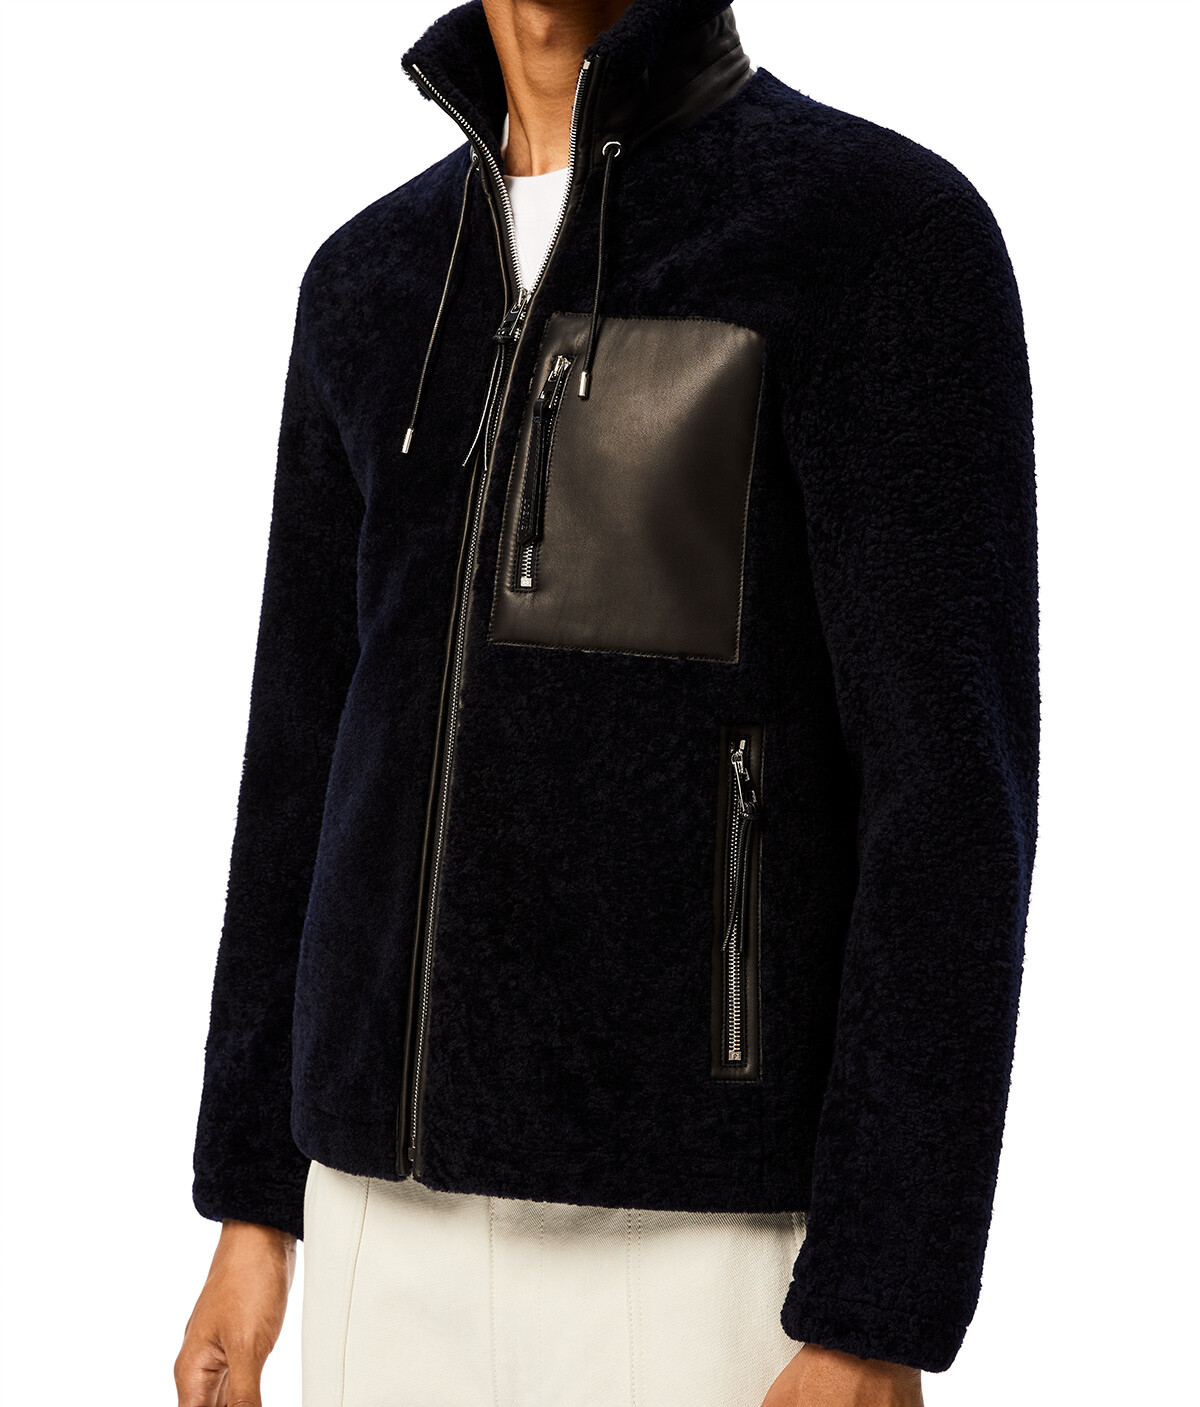 LOEWE Shearling Jacket Navy Blue/Black front